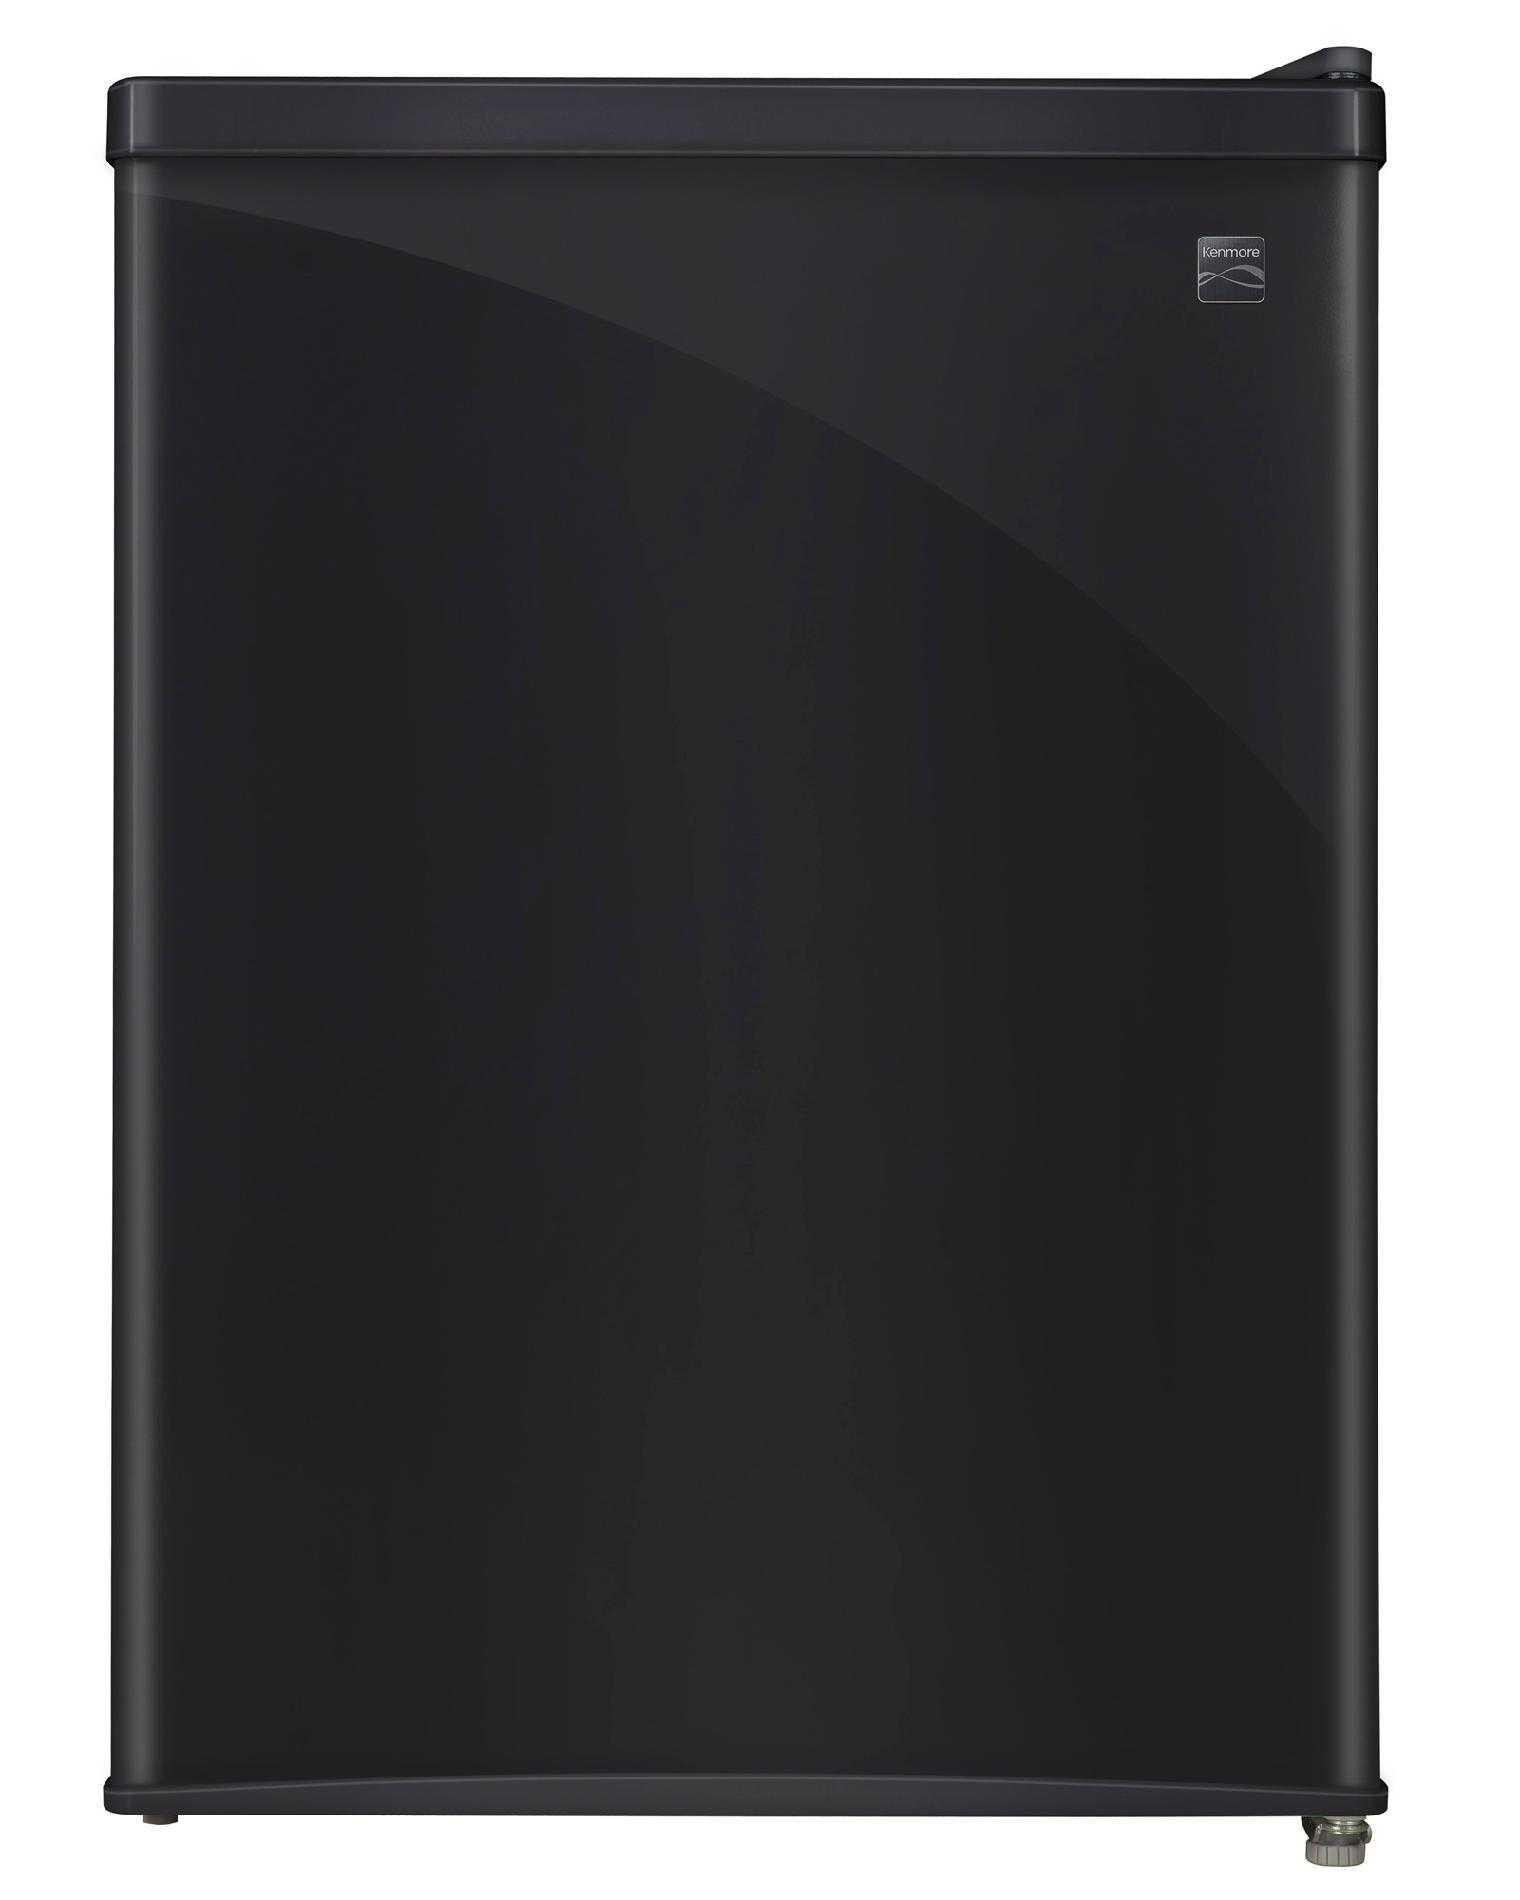 Kenmore 2.4 cu. ft. Compact Refrigerator - Black